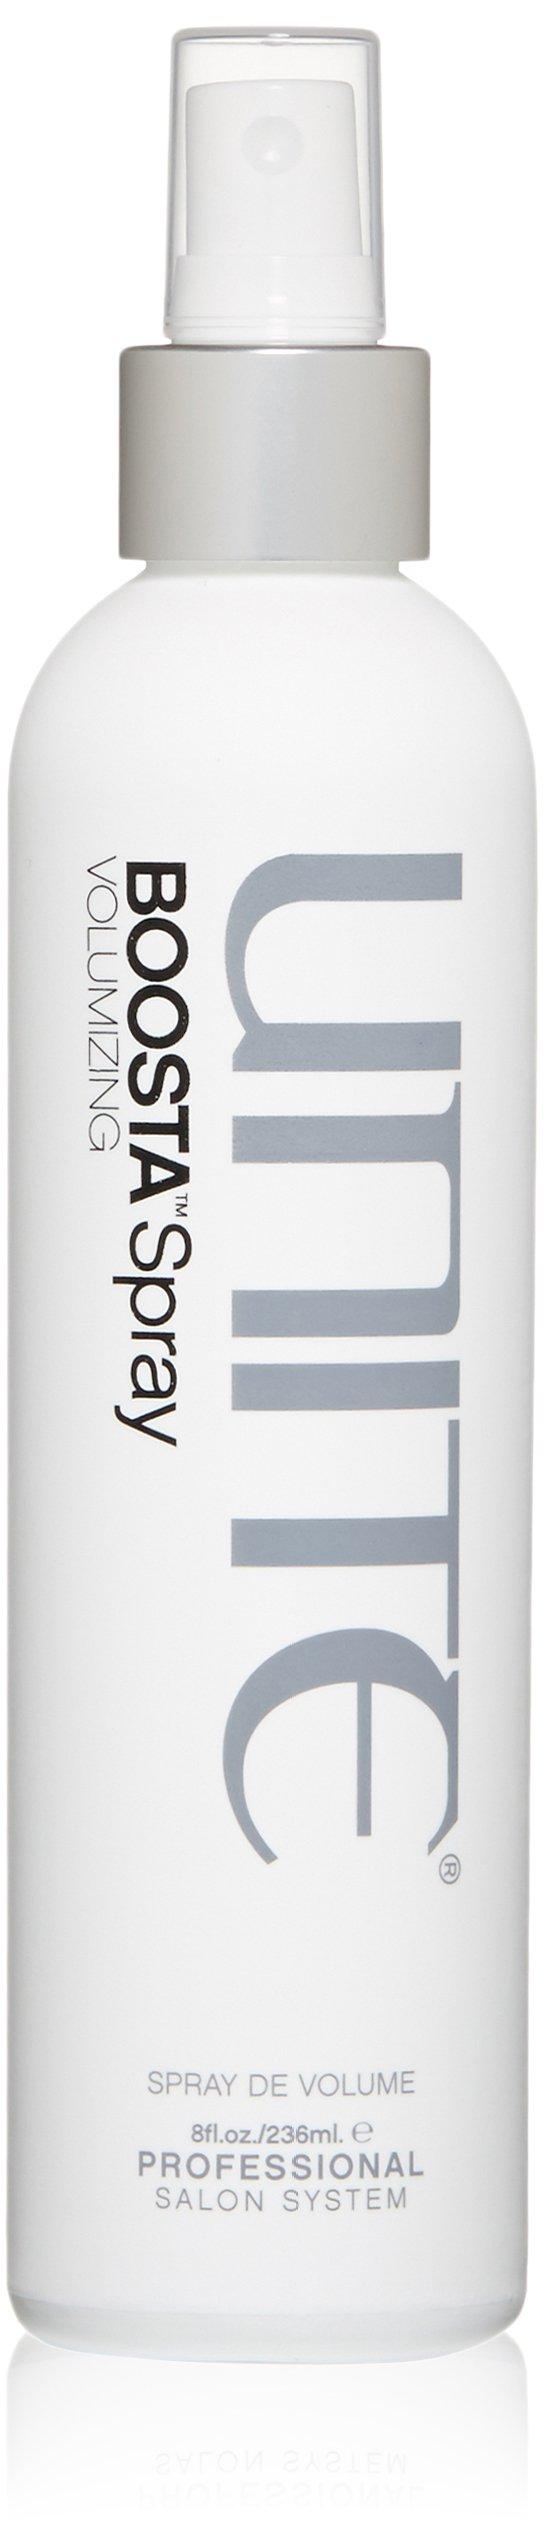 UNITE Hair Boosta Spray, 8 Fl oz